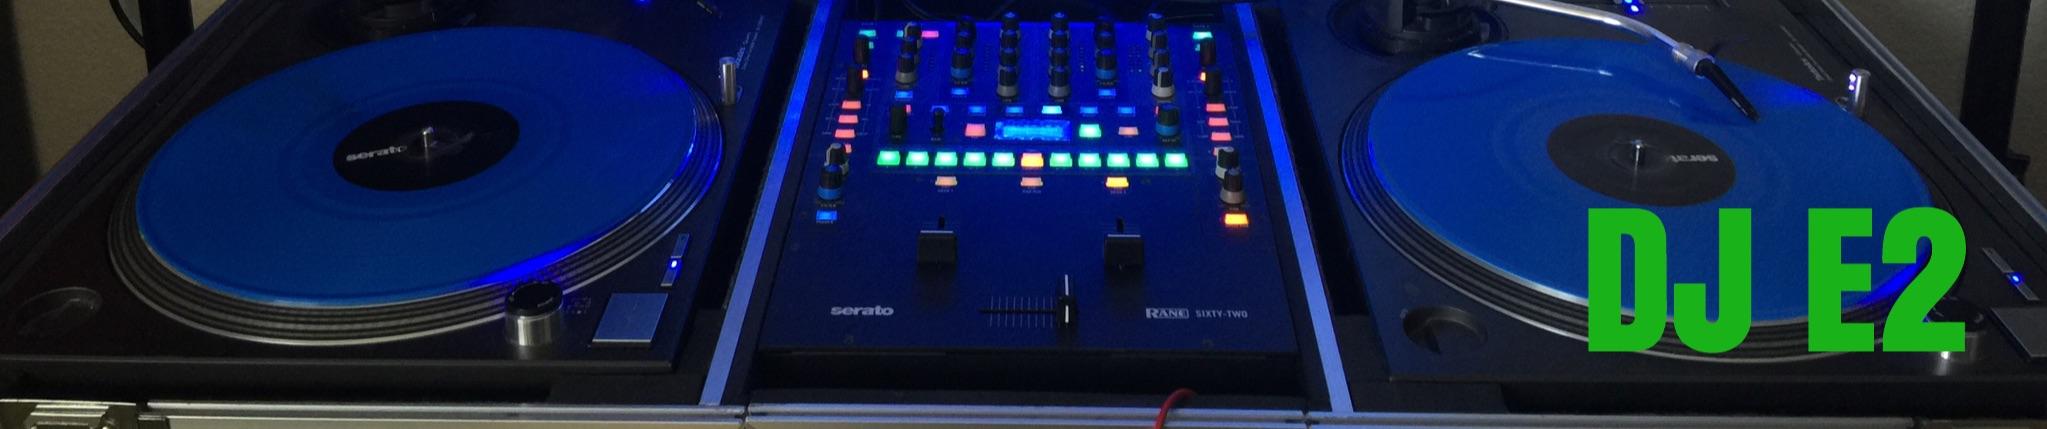 Summer 2018 Hip Hop & RnB Mix by DJ E2 | Free Listening on SoundCloud